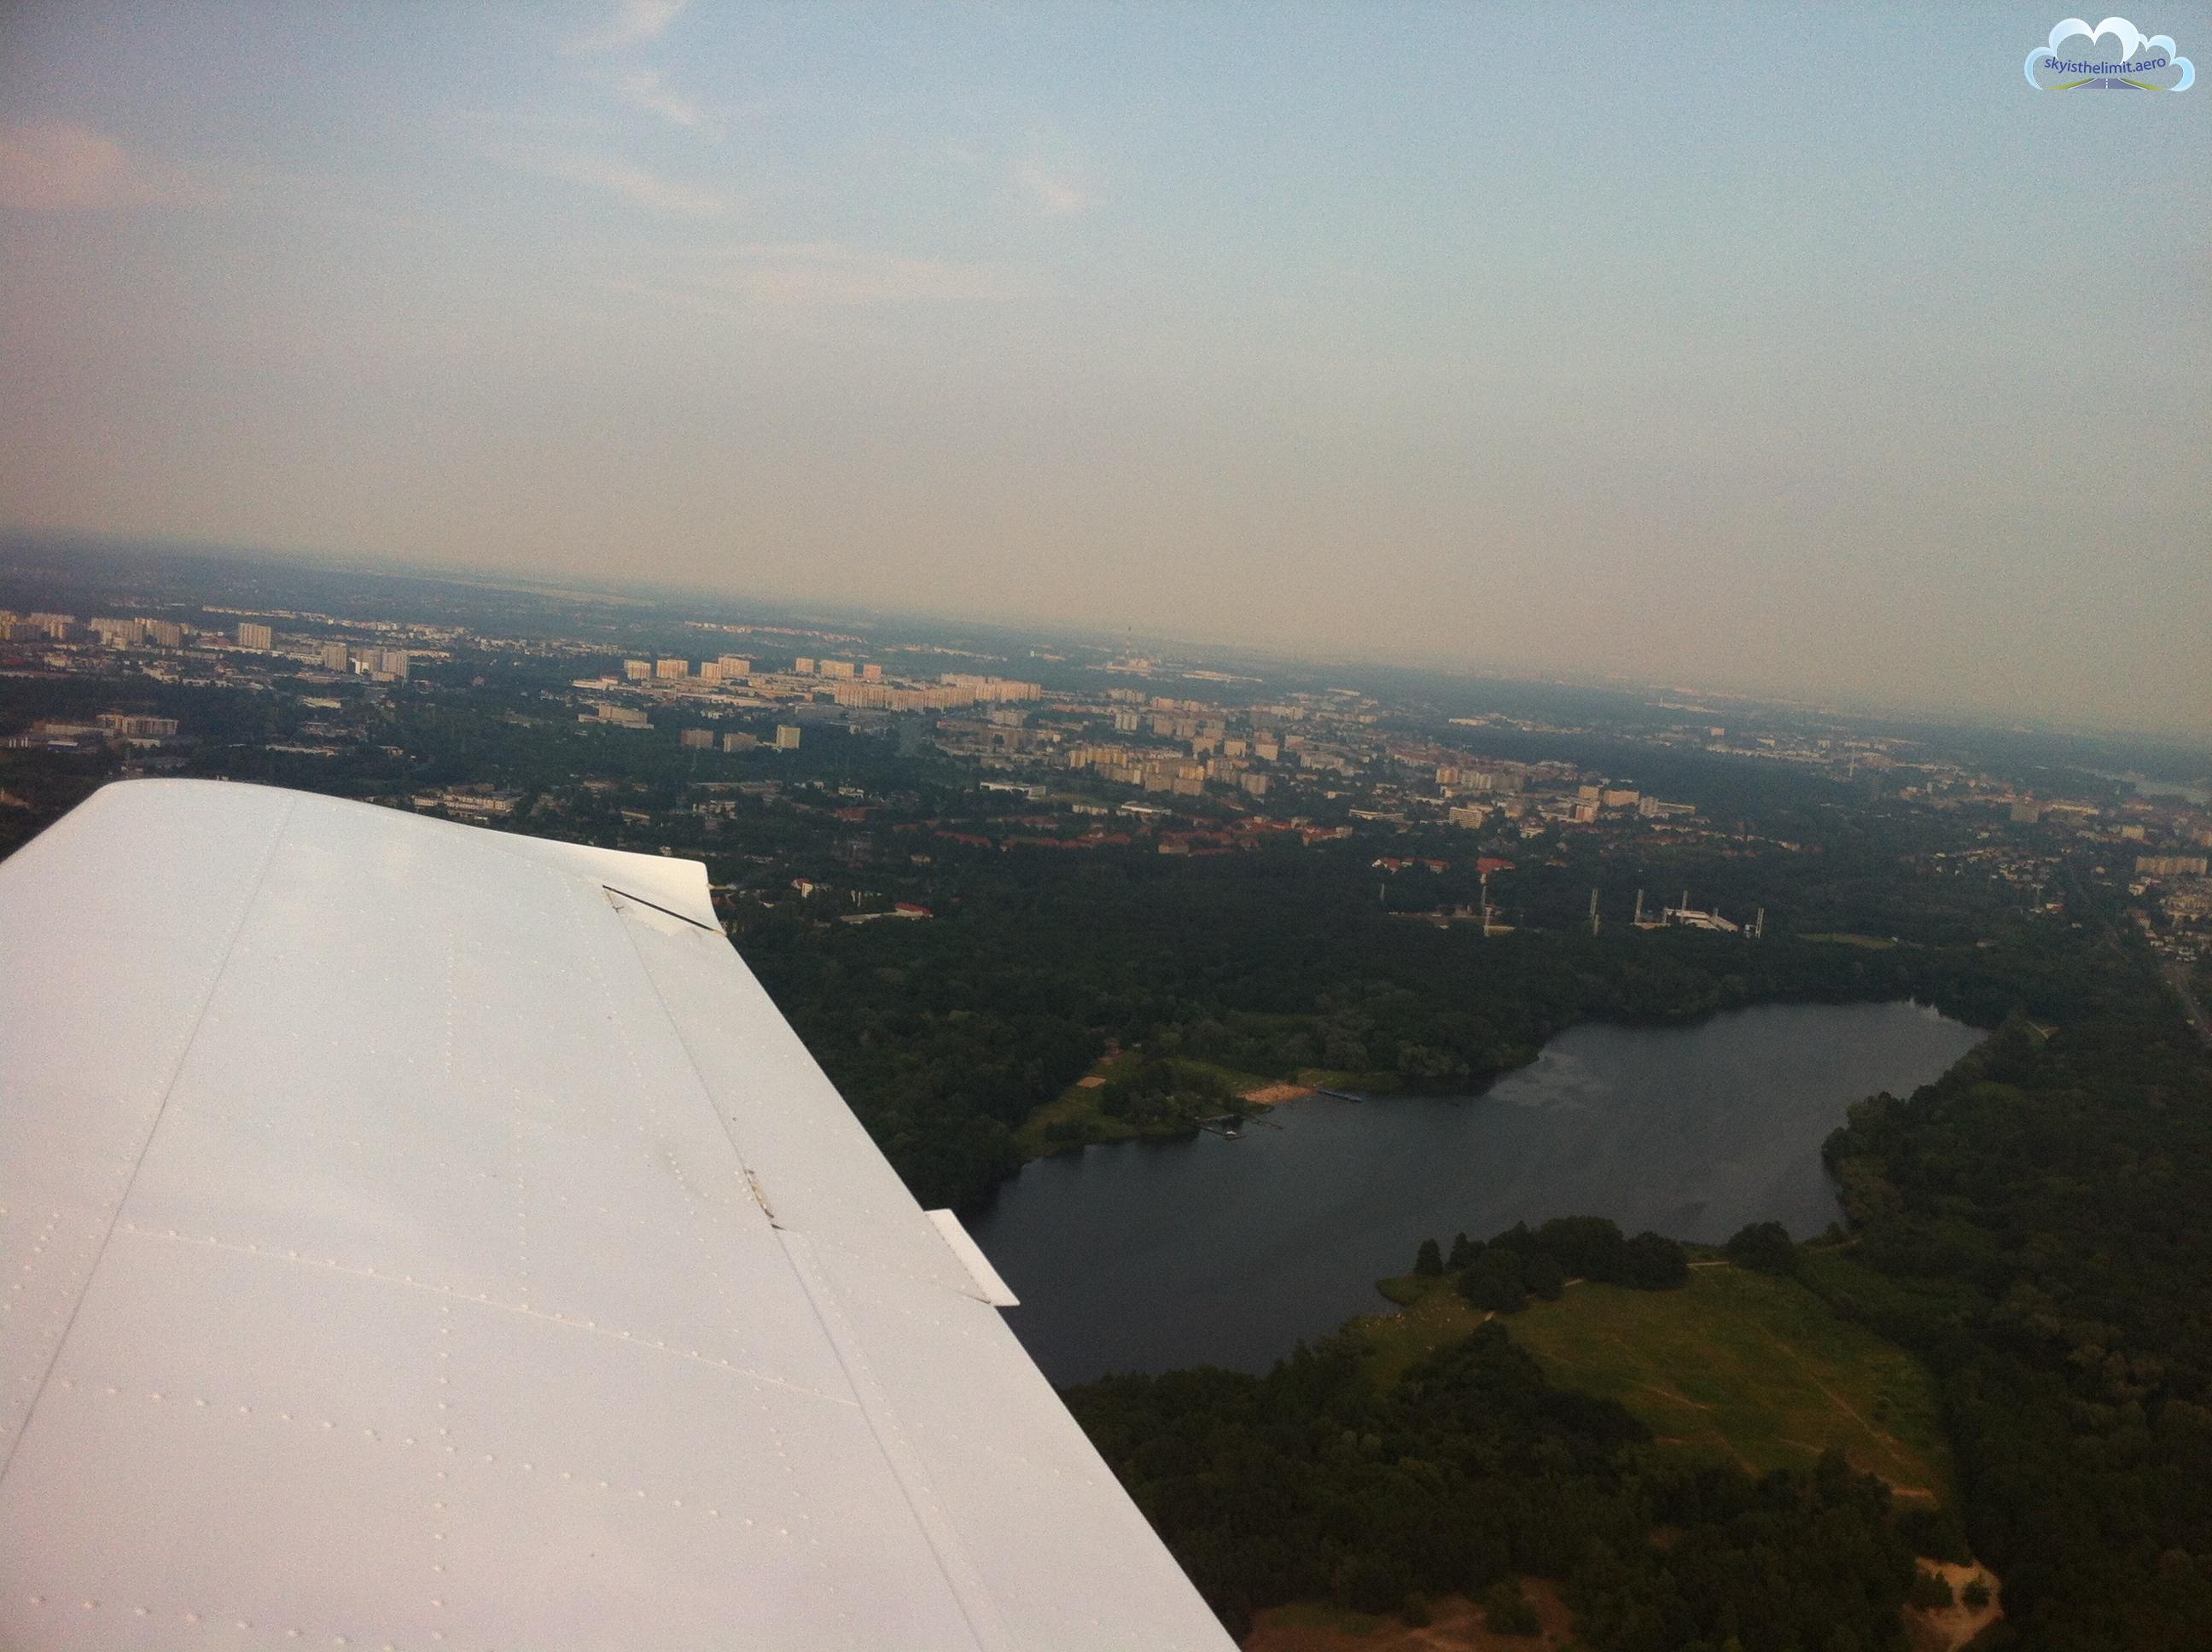 Poznań-Ławica, EPPO, po odlocie z pasa 10, jezioro Rusałka